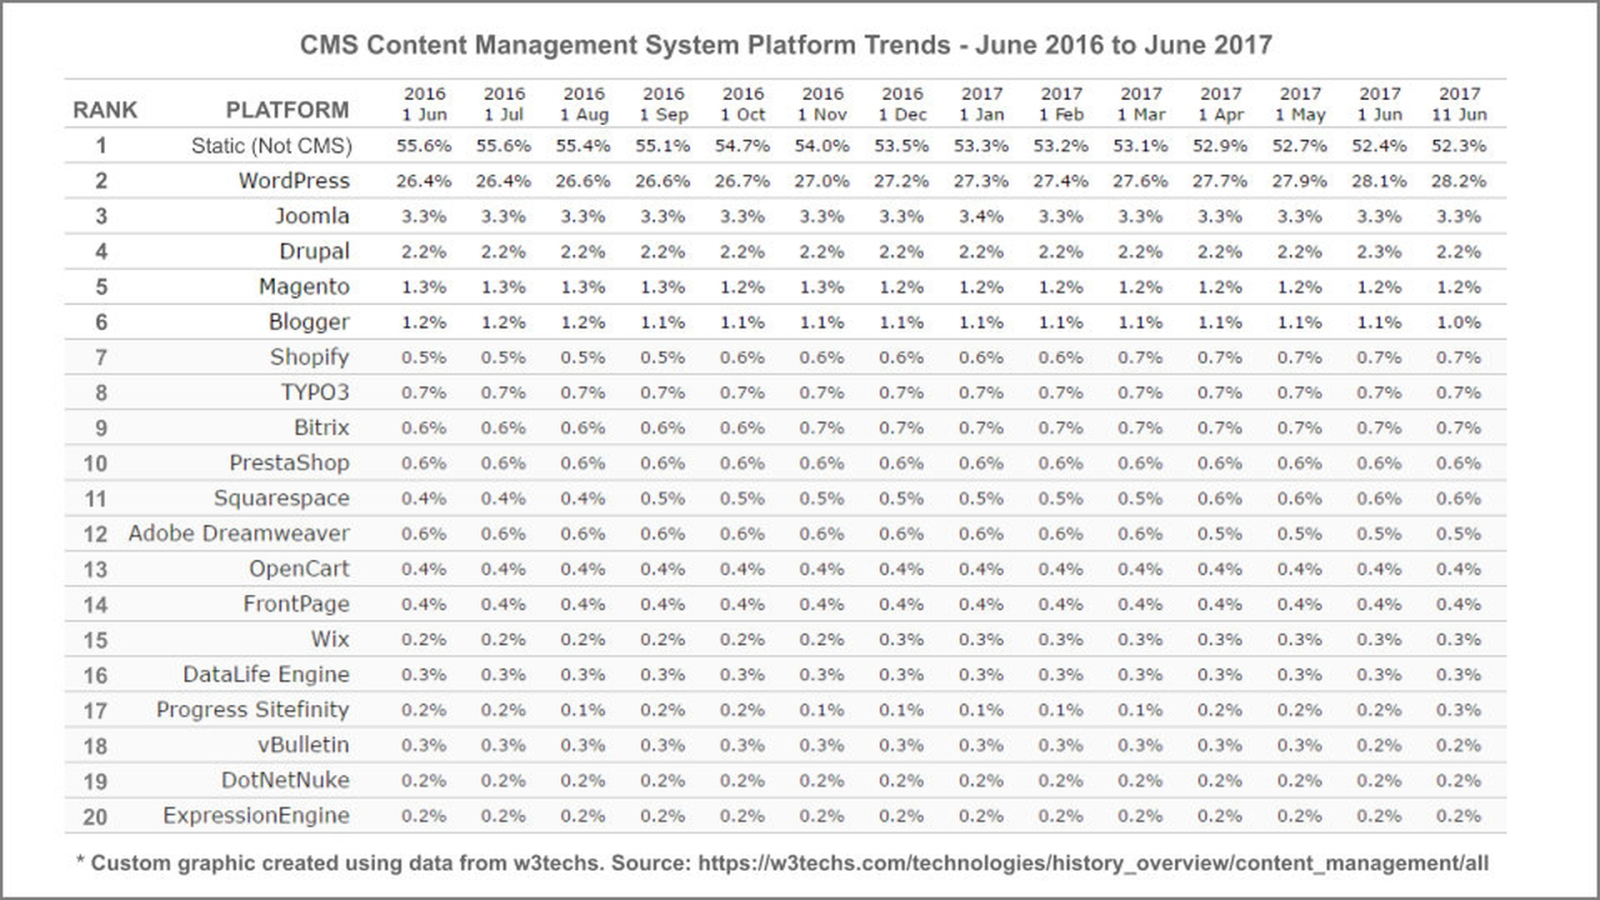 cms platform trends 2016-2017